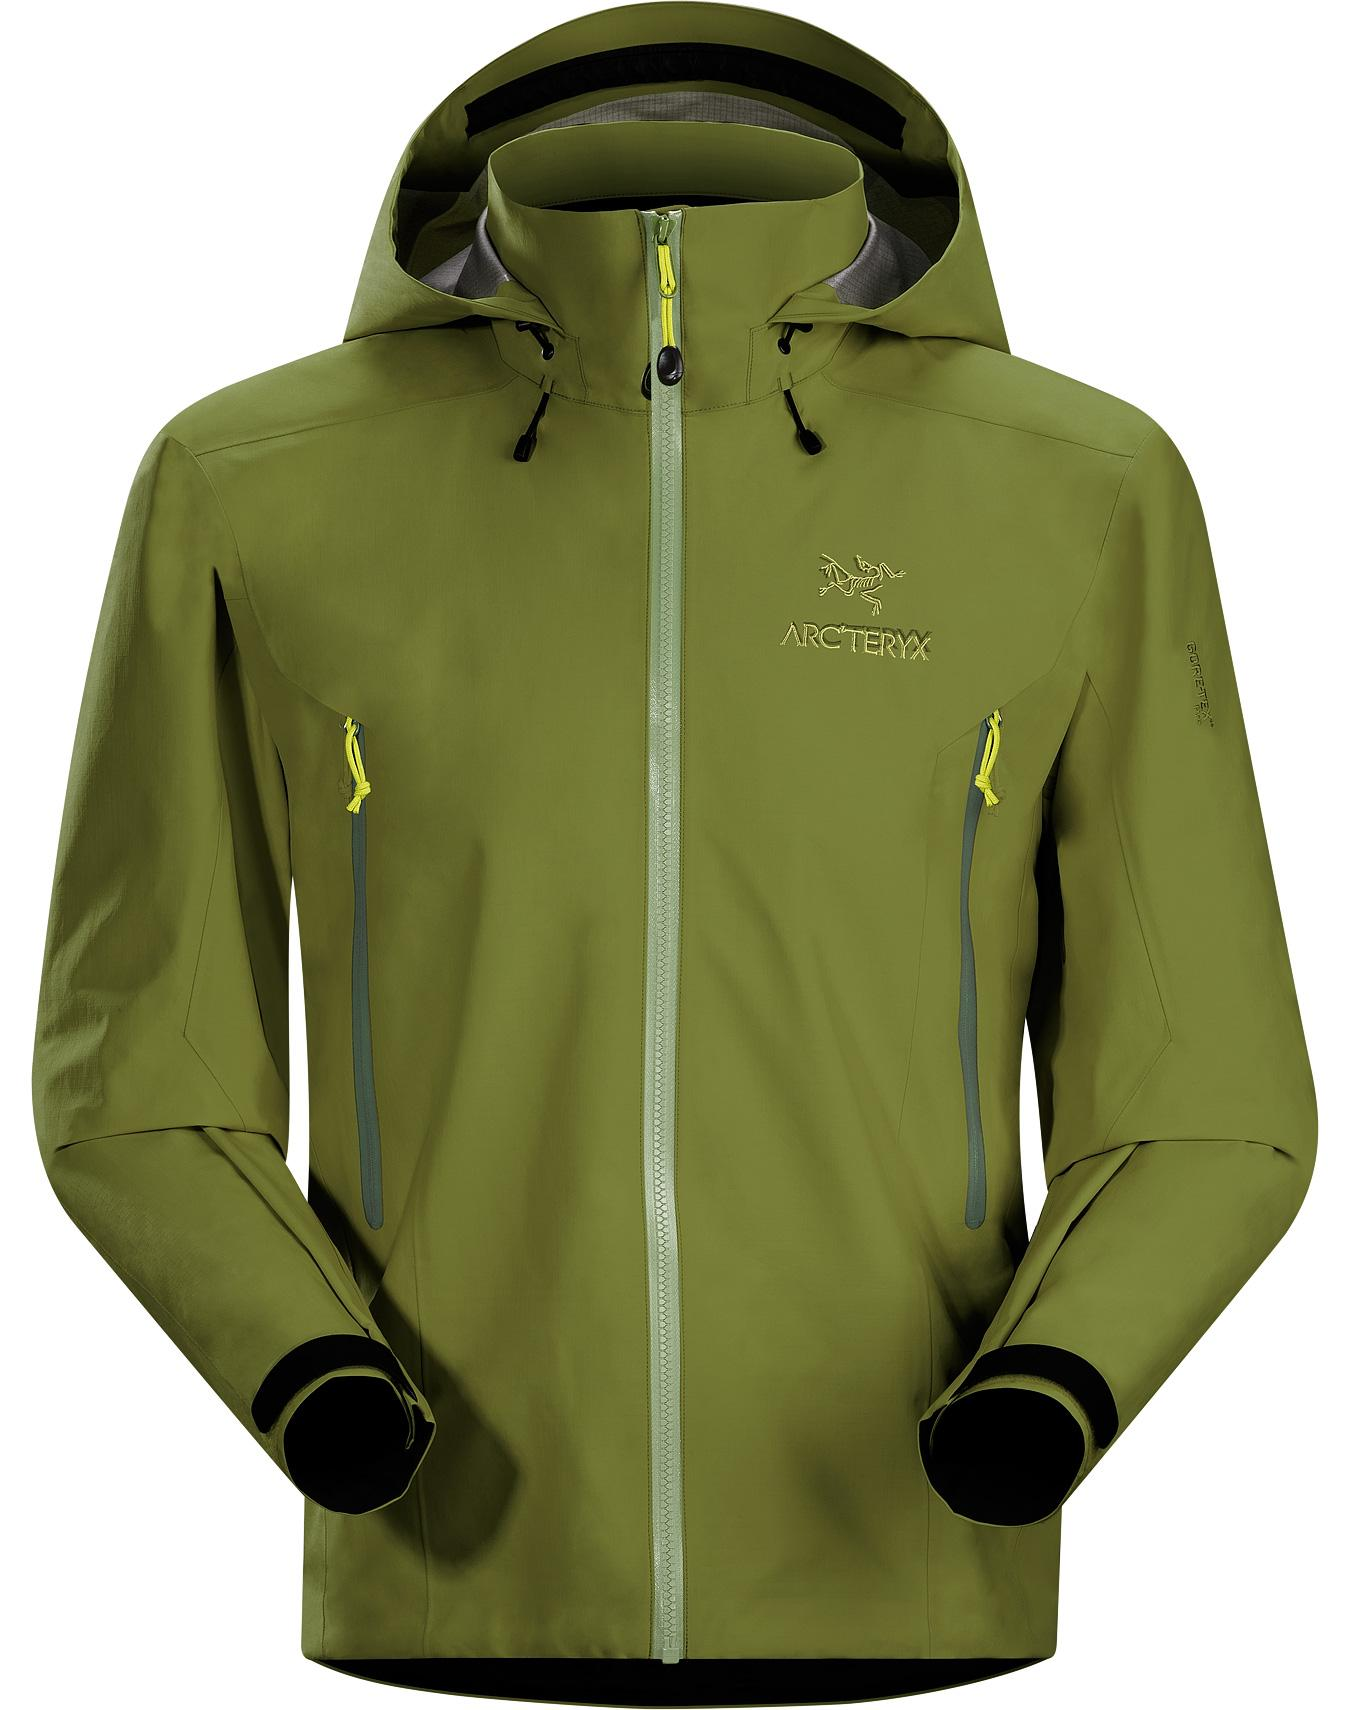 [ Arcteryx 始祖鳥 ] 雨衣/健行/背包客/玉山 Beta AR 登山雨衣/風雨衣 專業款 12701 男 Gore Tex Pro 雙葉綠